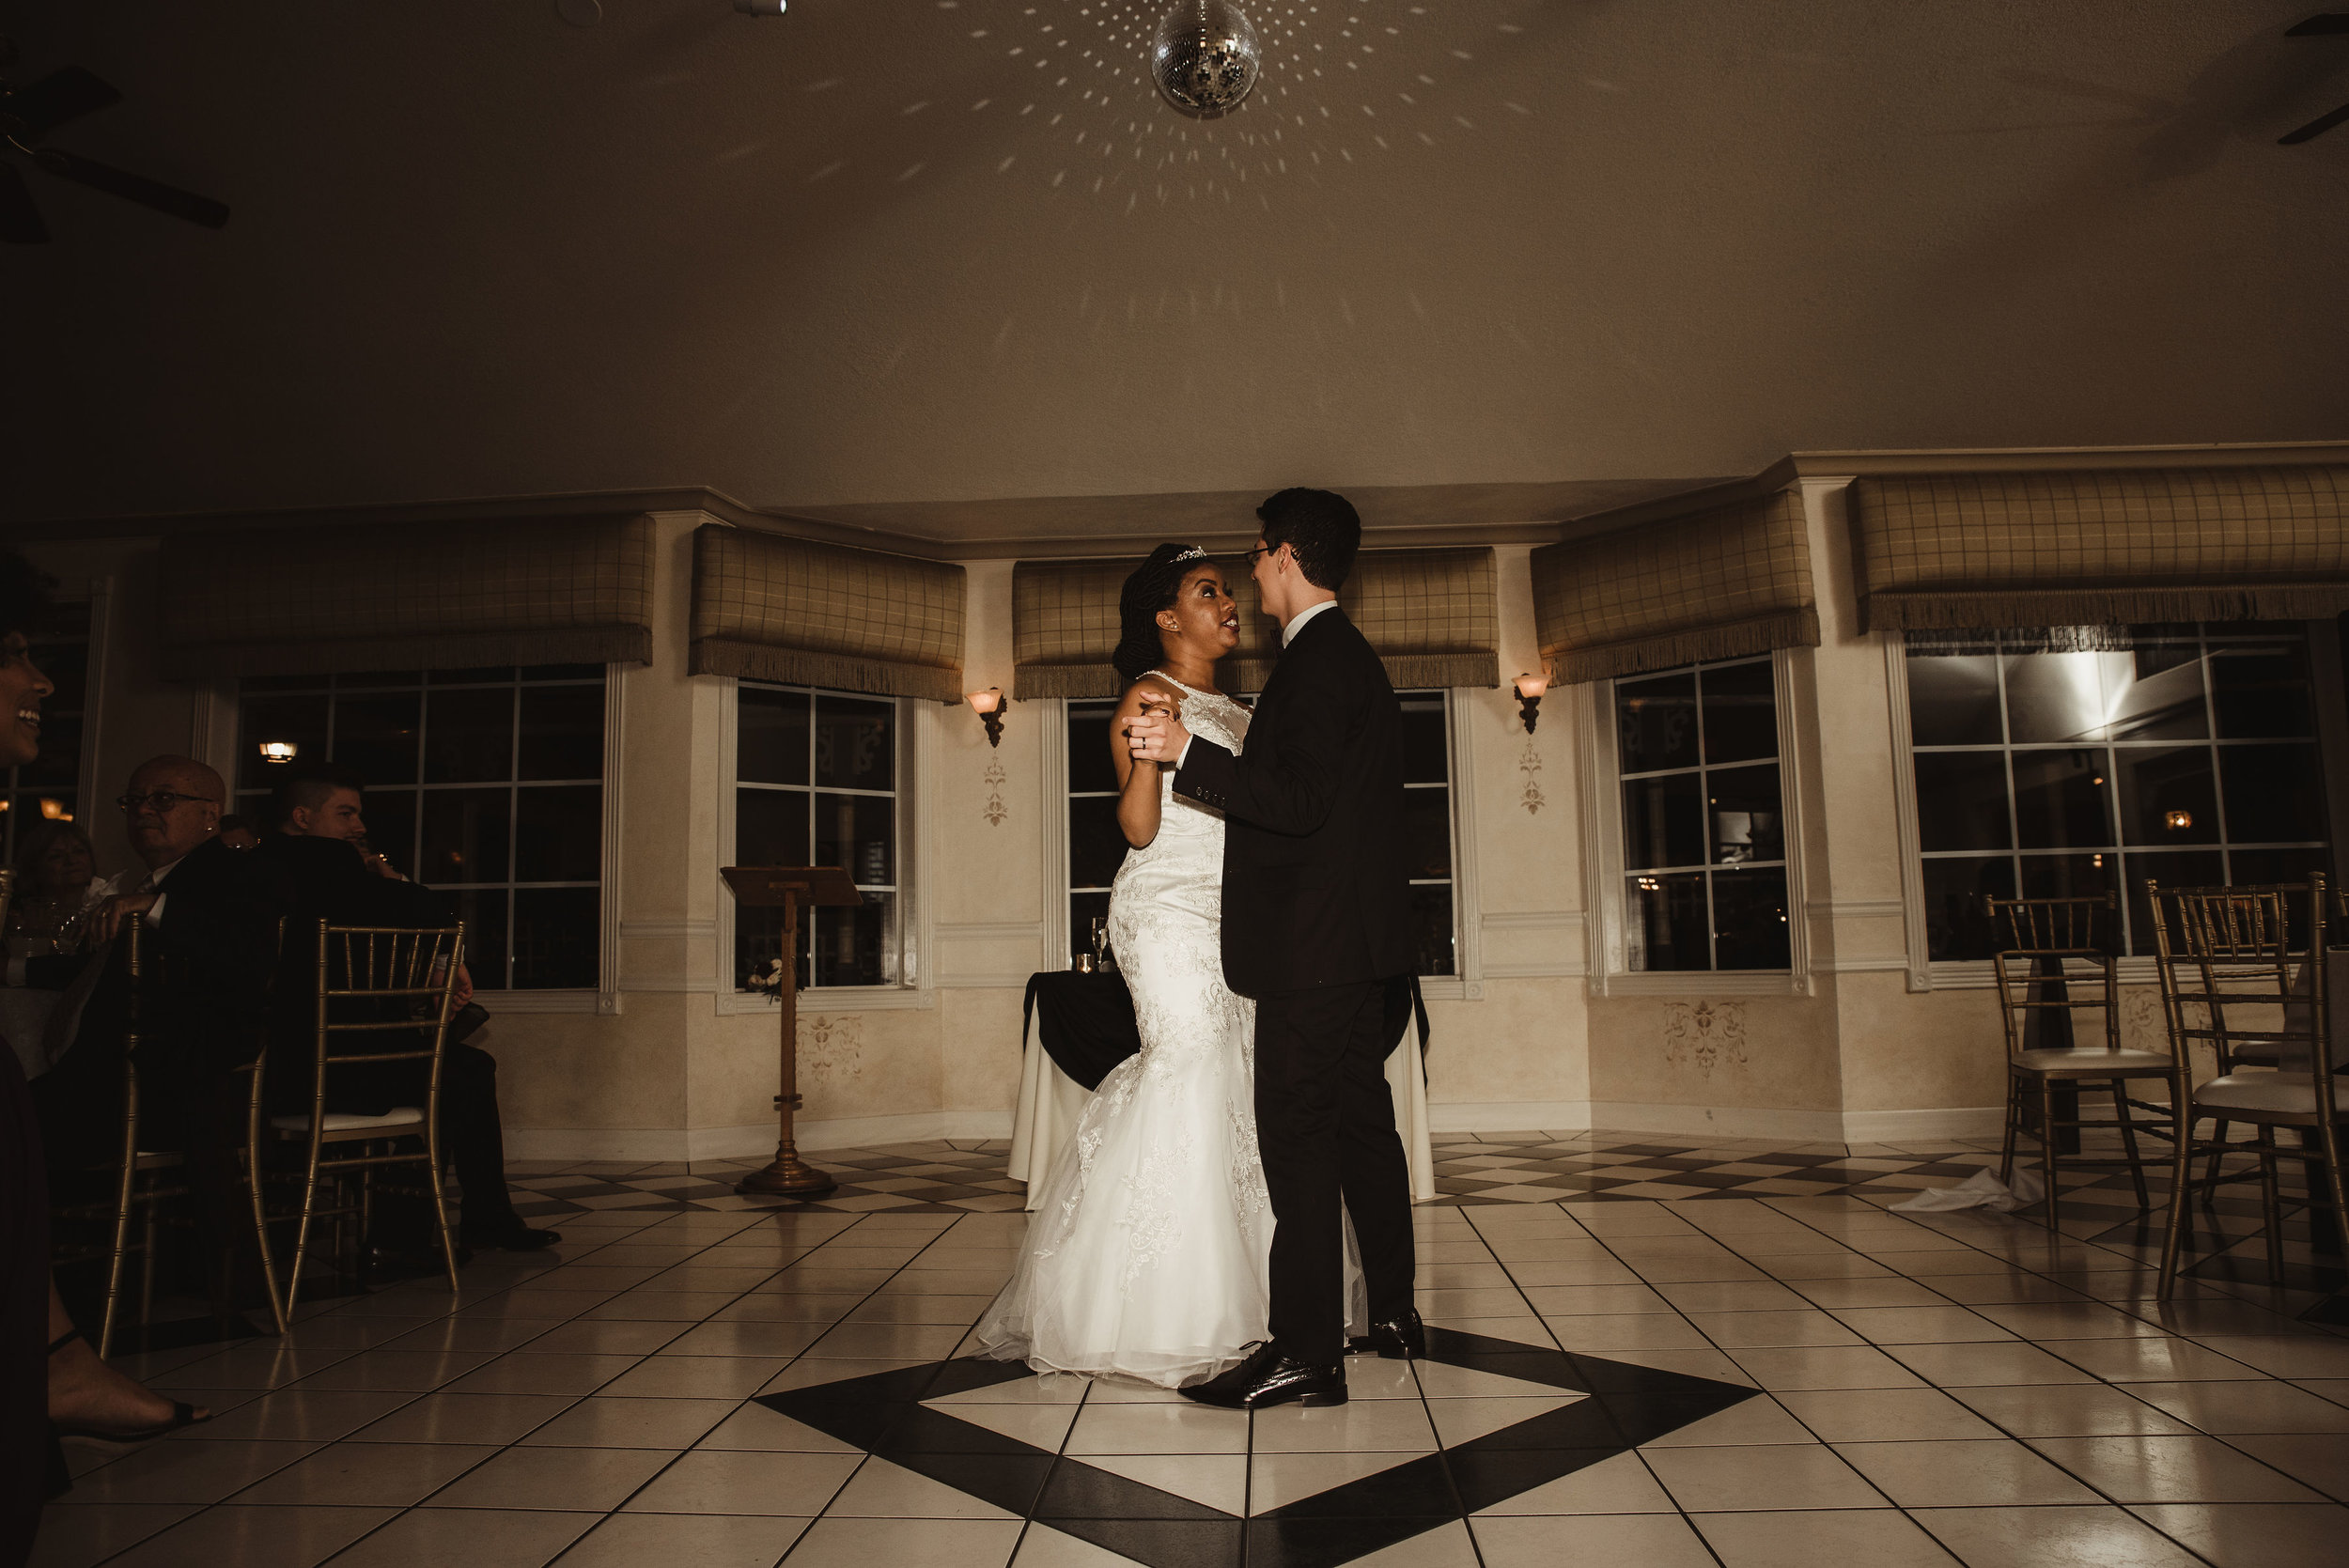 Vanessa+JoshWedding++++-446.jpg